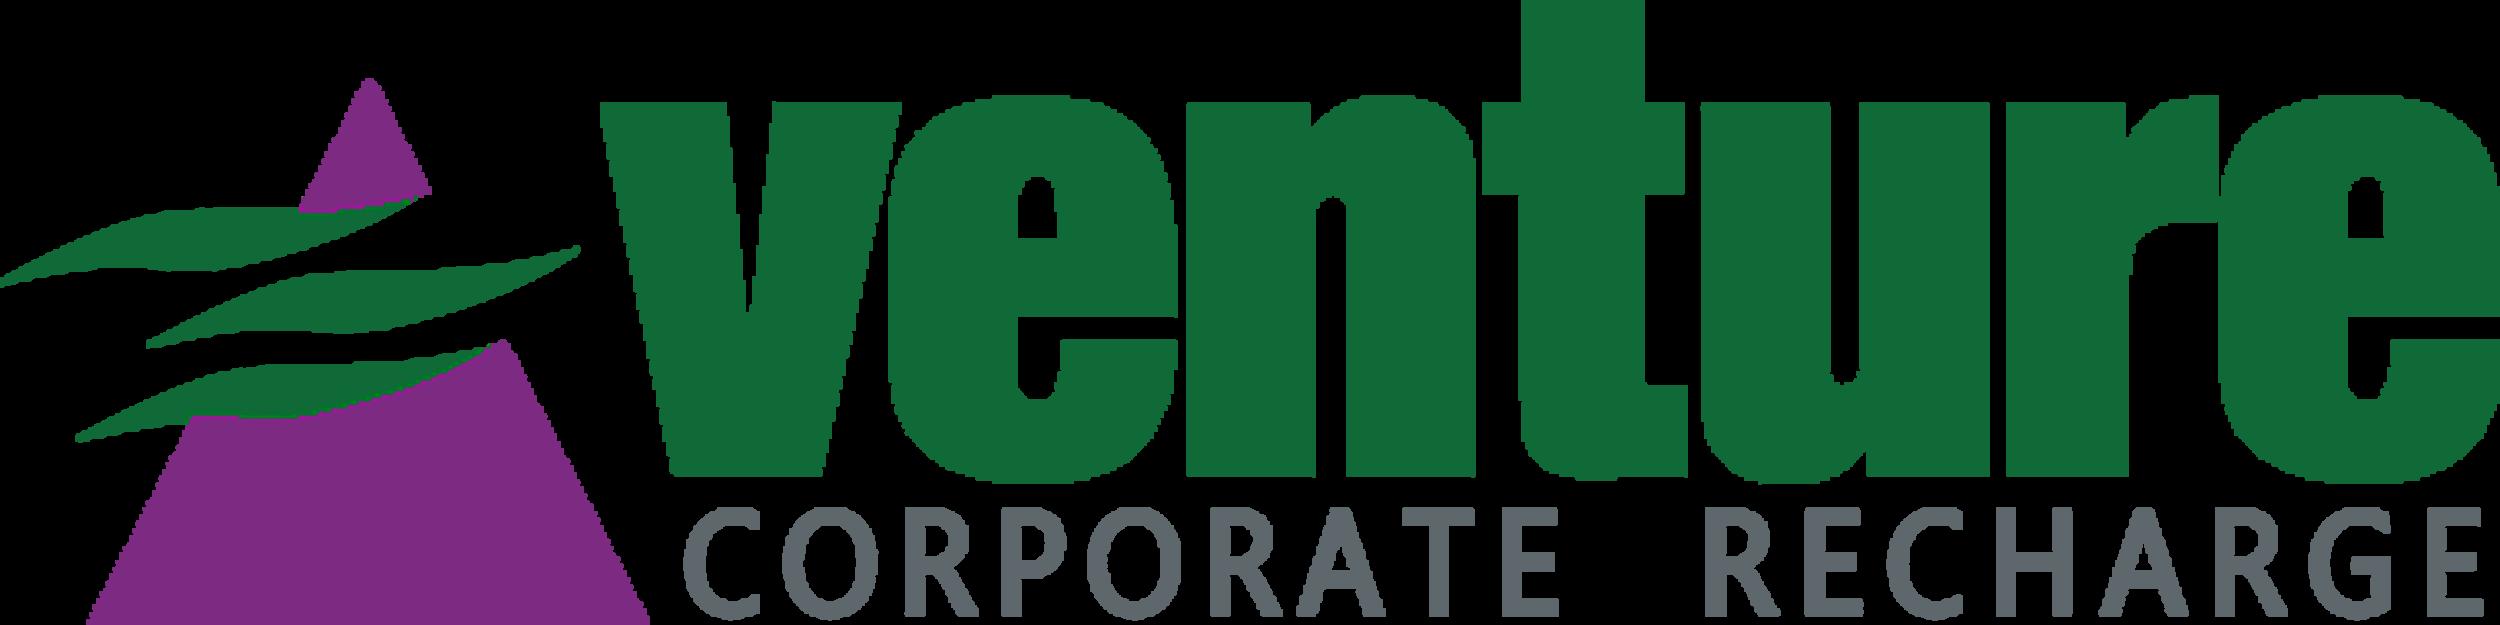 Final-venture-logo.png